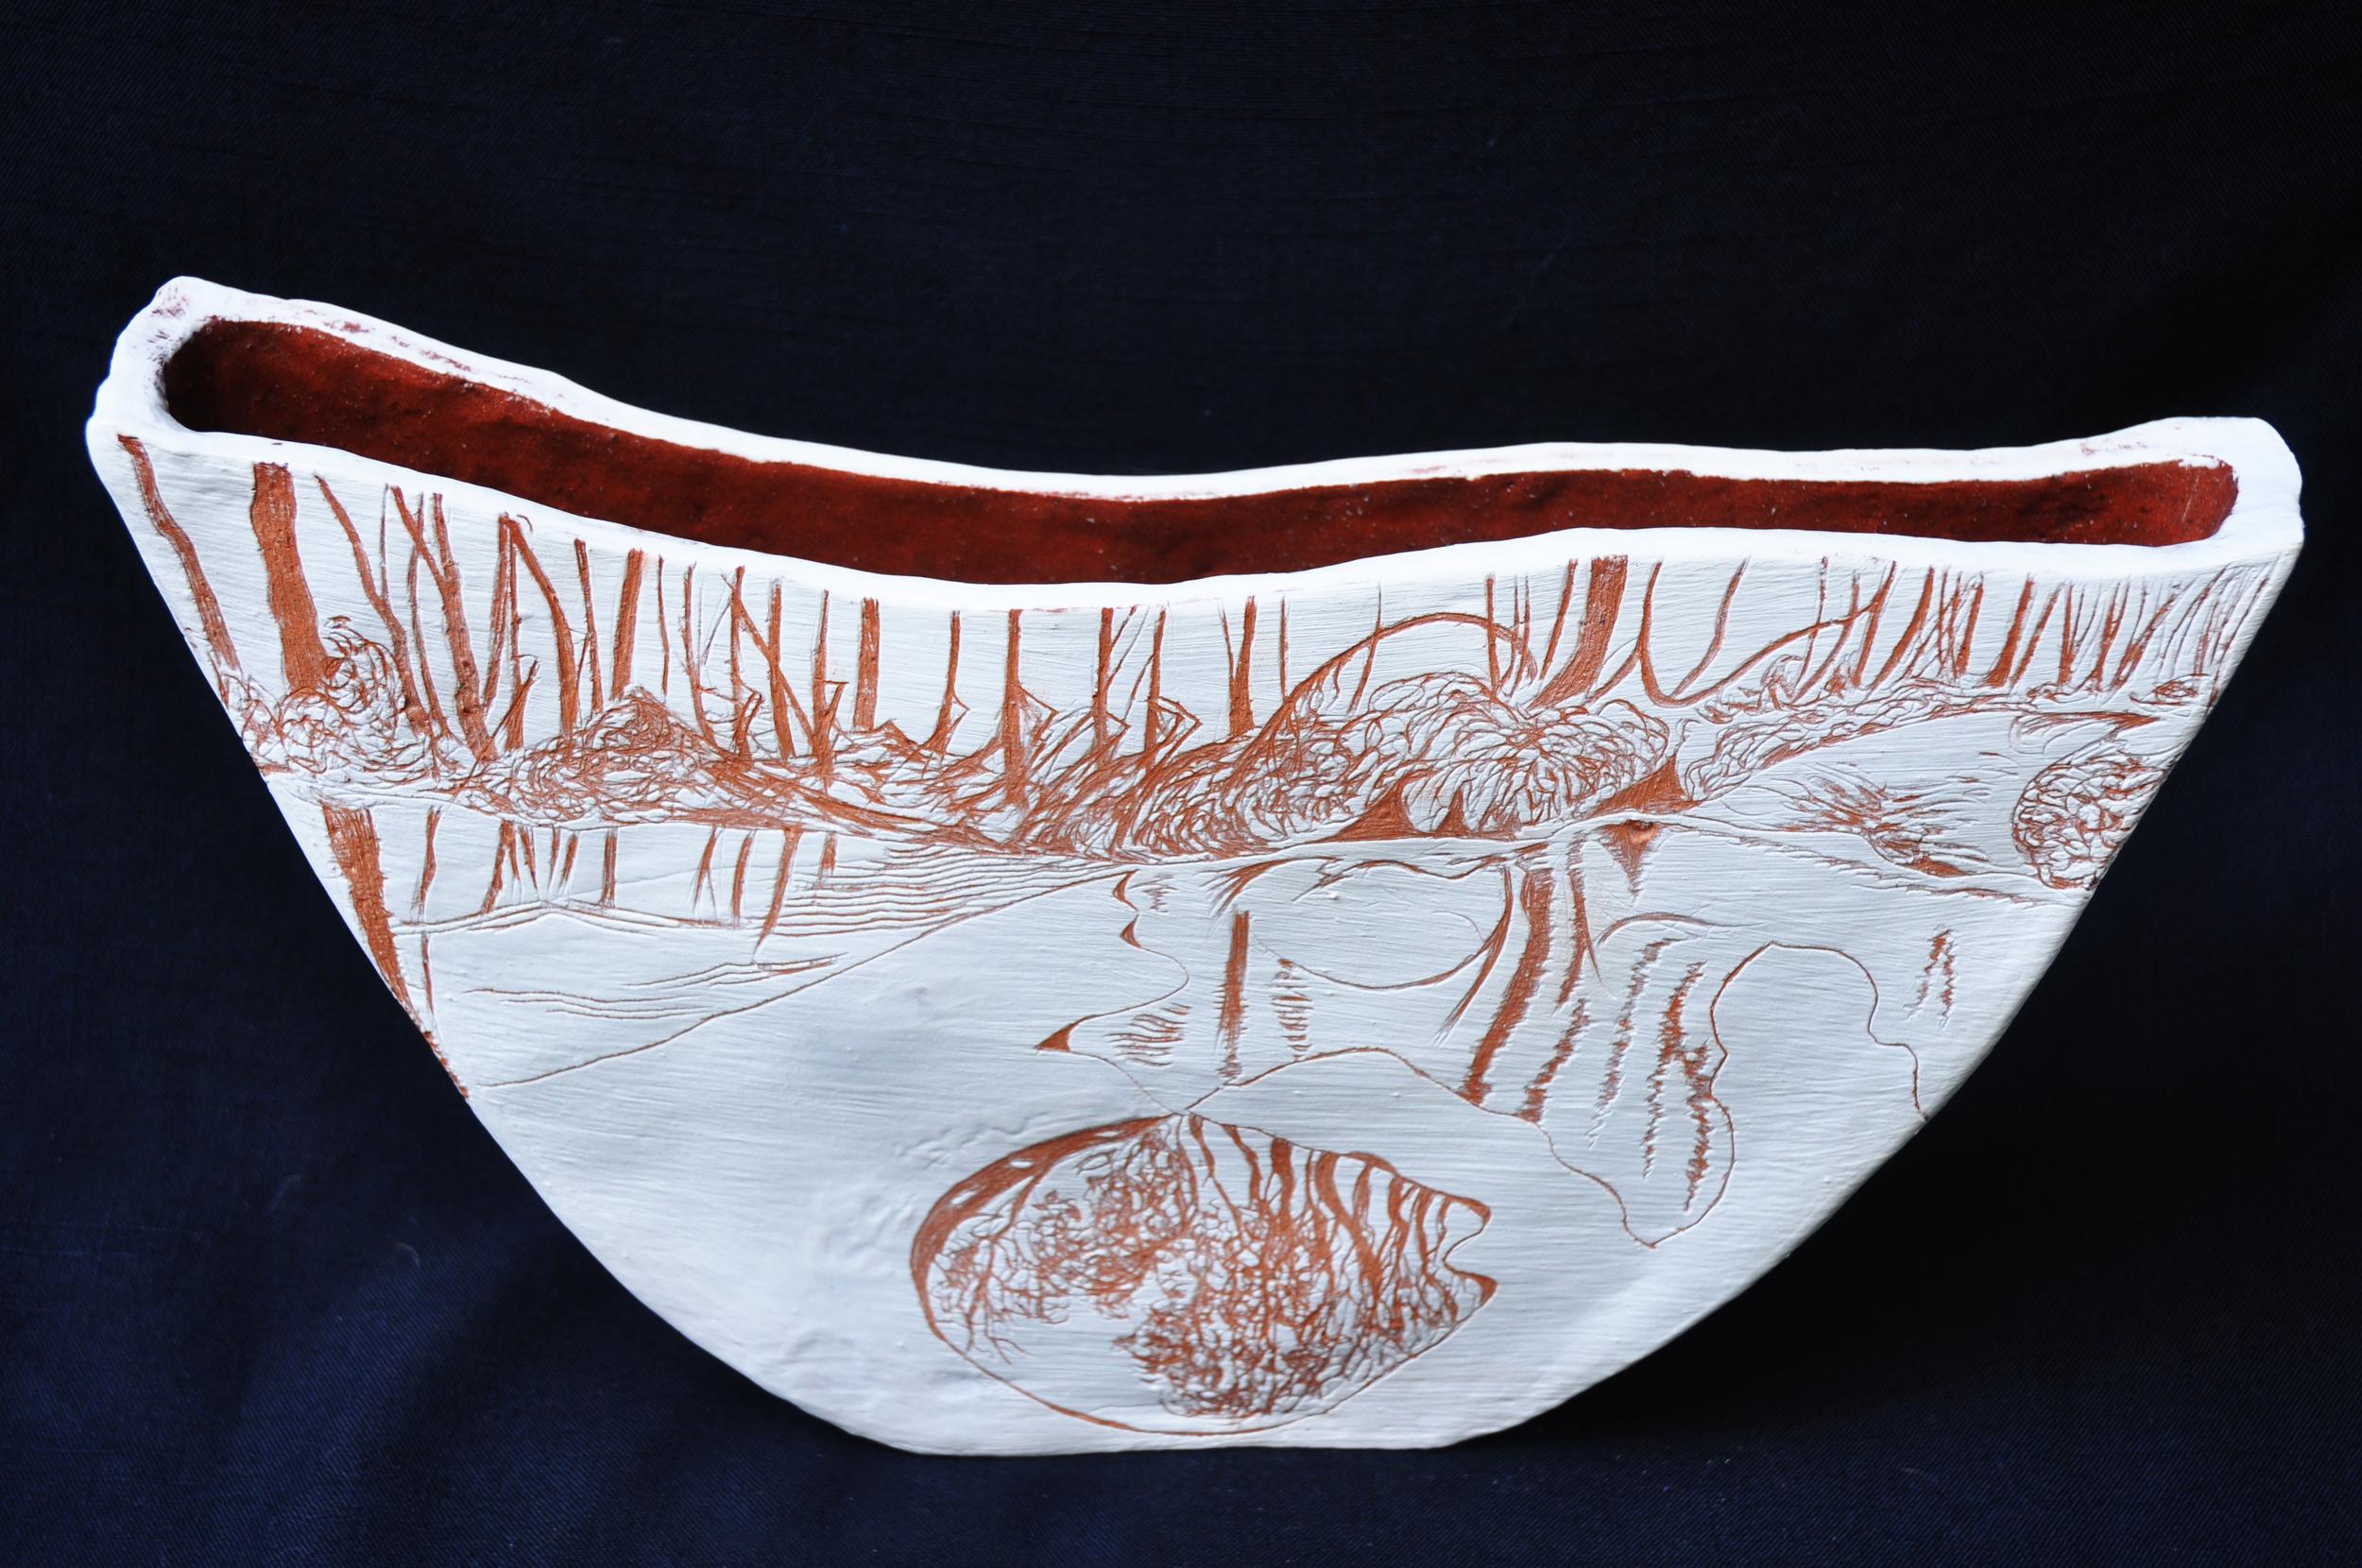 Am Bay Burnt reflections.Terracotta Paperclay.jpg